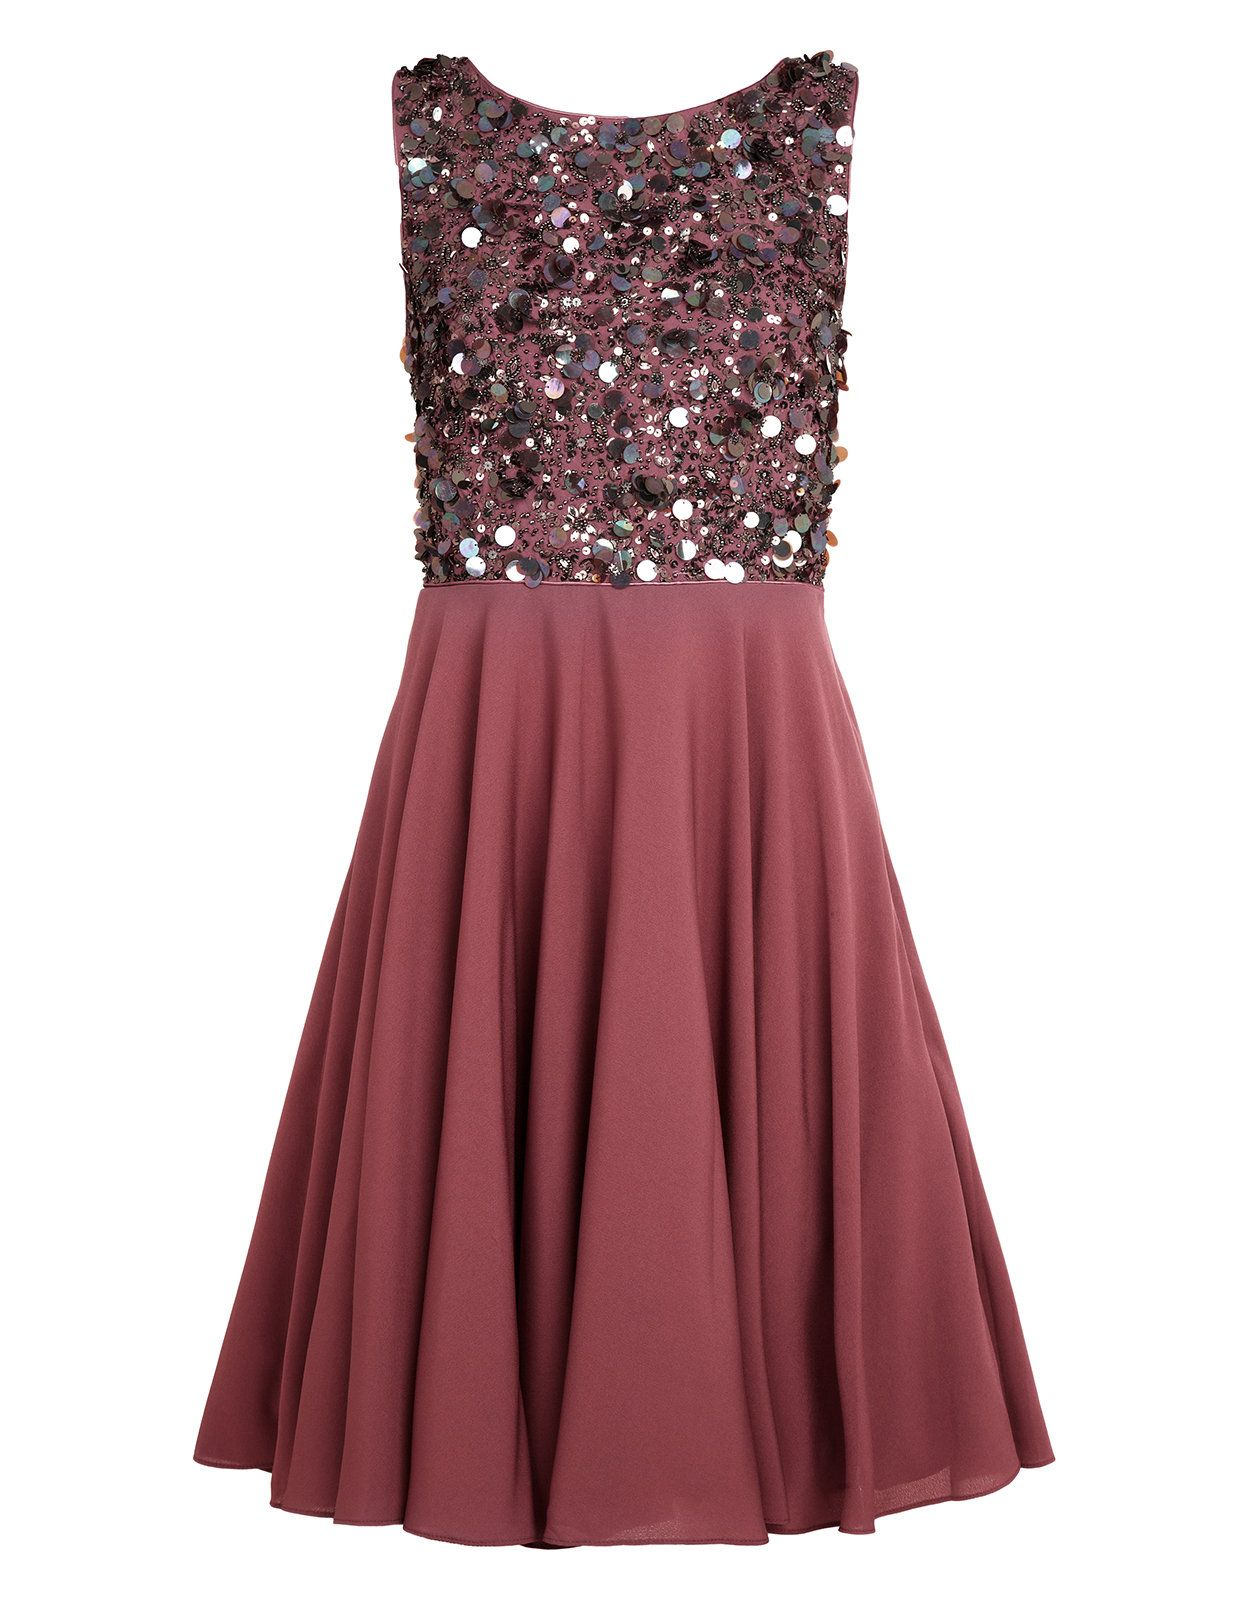 Alisa dress pink monsoon lego pinterest pink and dresses alisa dress pink monsoon ombrellifo Choice Image